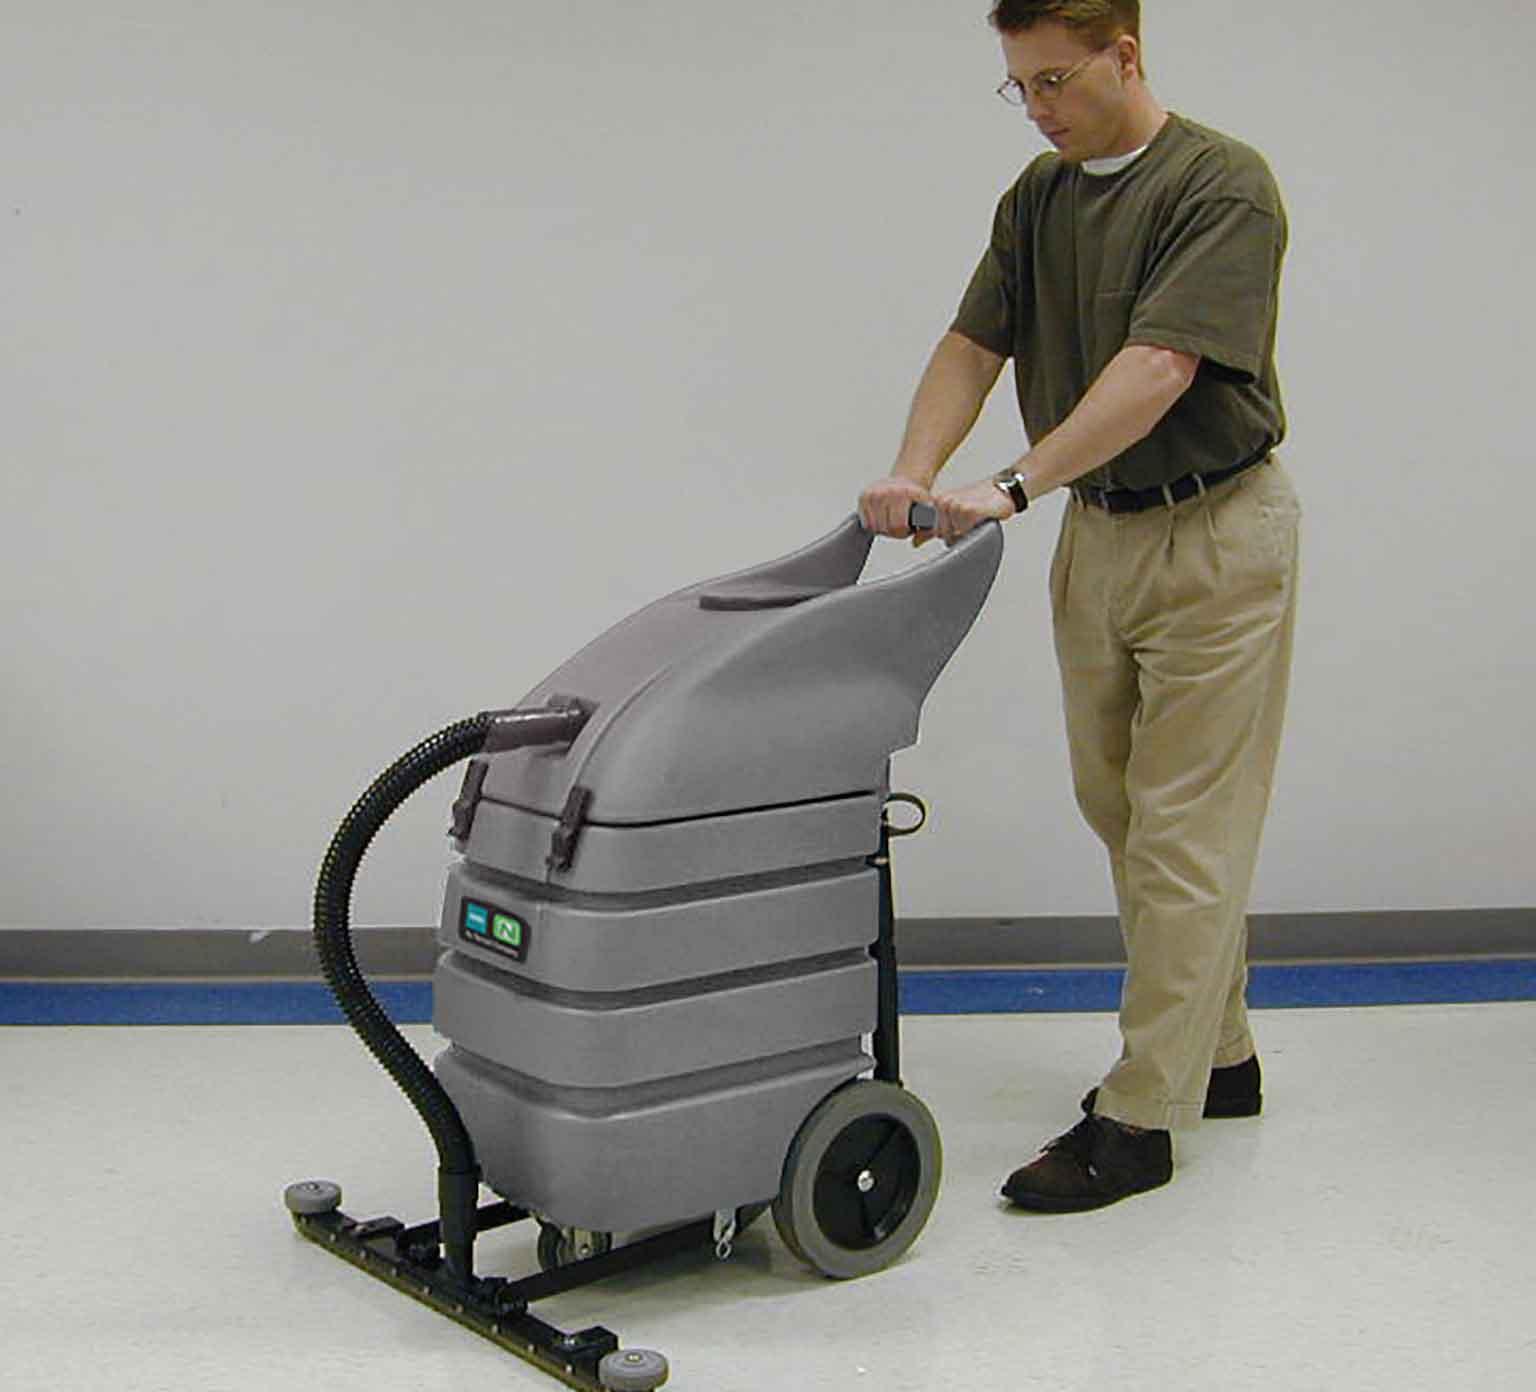 V-WD-15 / V-WD-15S / V-WD-16P / V-WD-16B Wet / Dry Vacuums